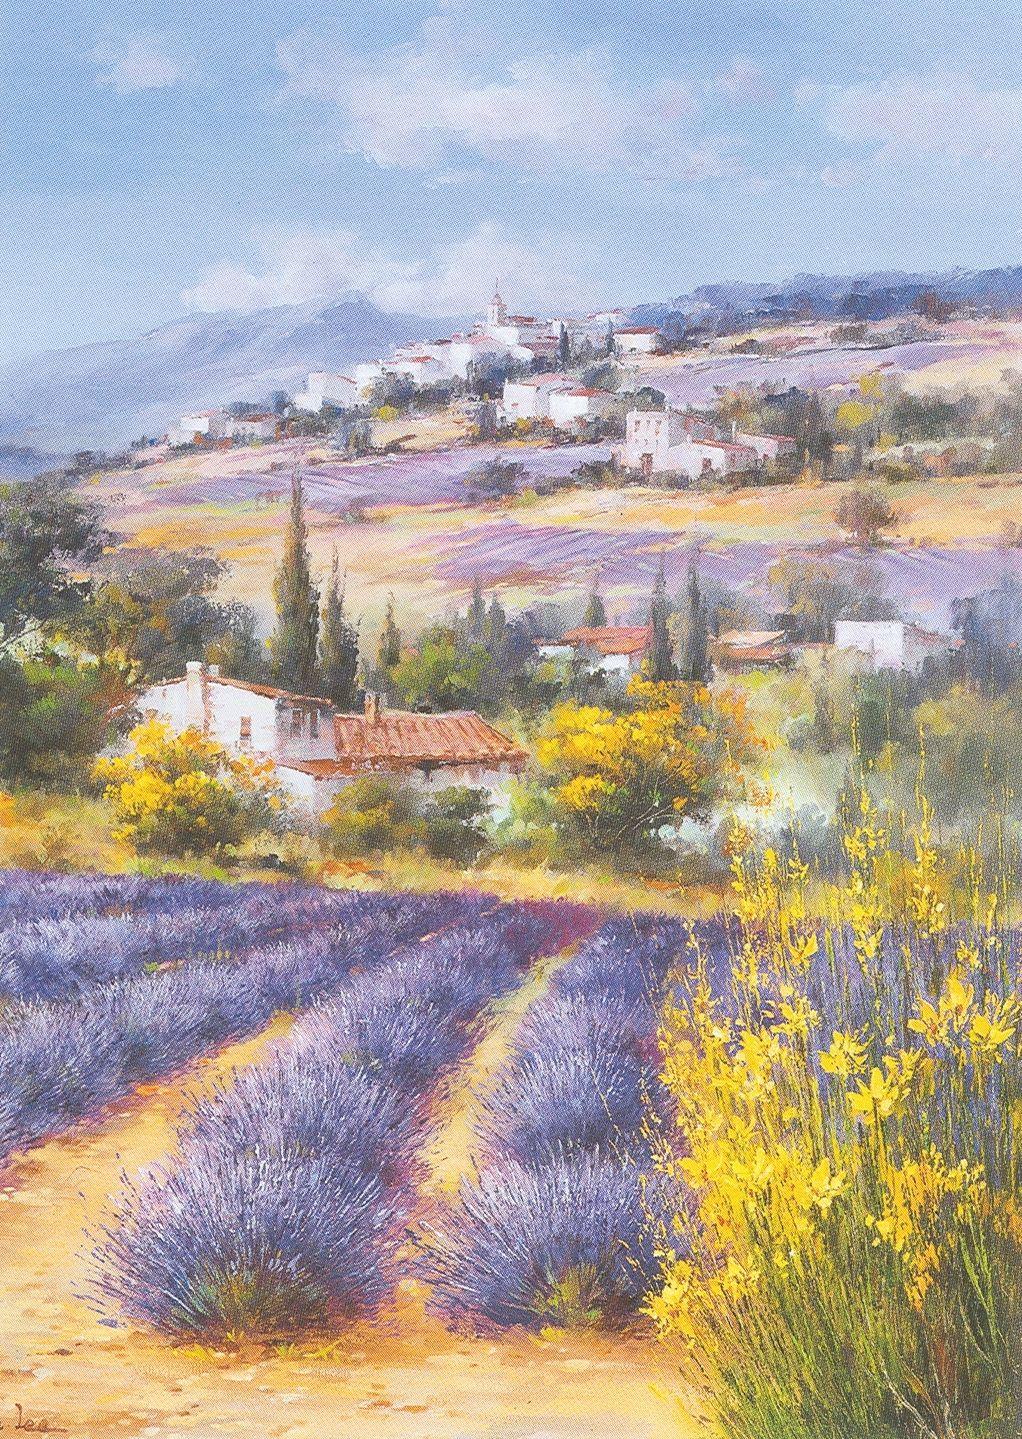 tableaux des paysages de provence occident lavendar. Black Bedroom Furniture Sets. Home Design Ideas